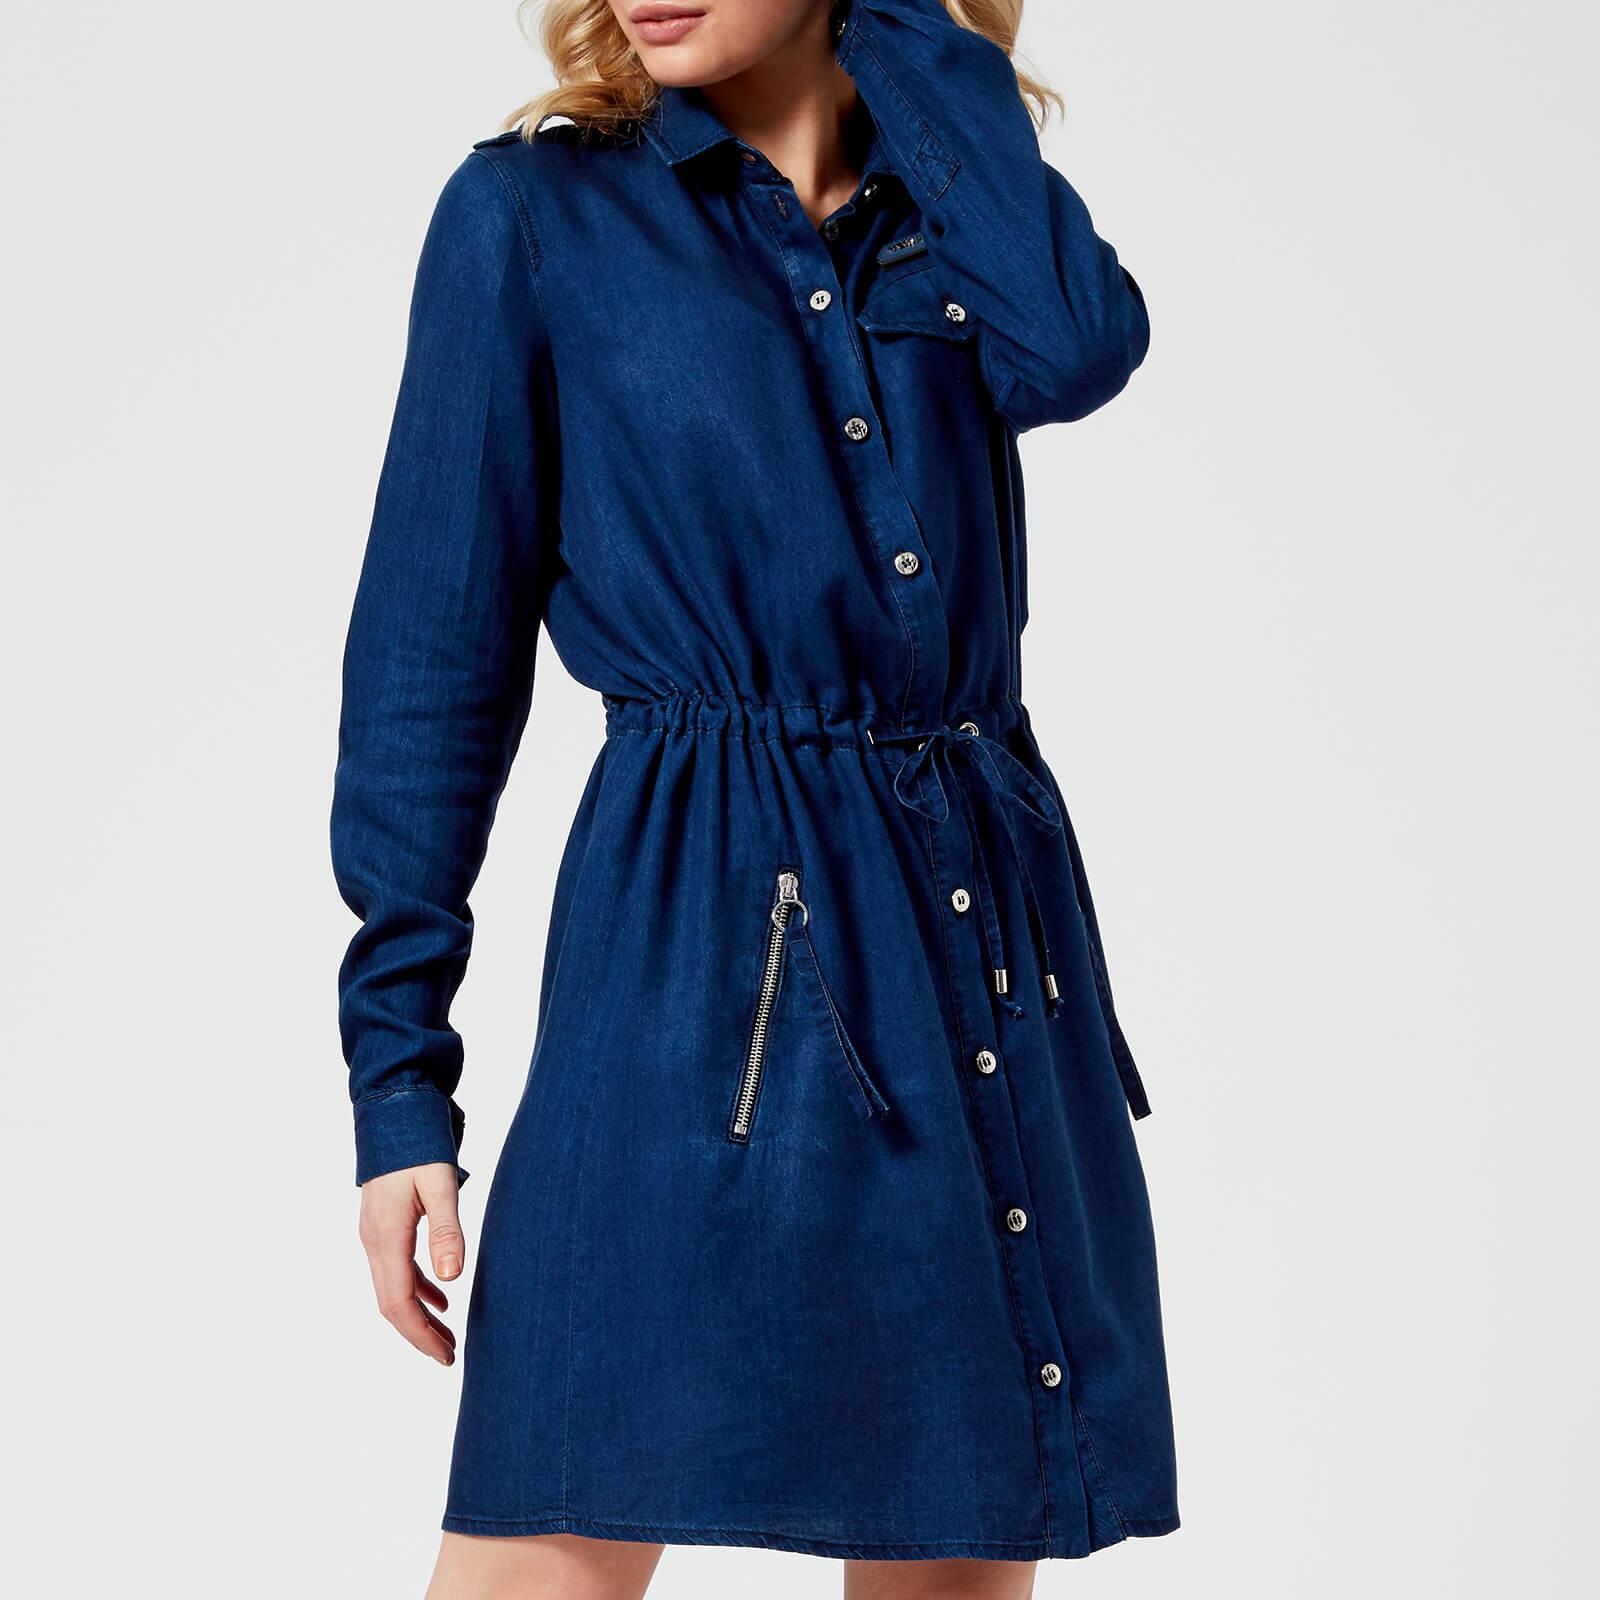 abc5efac1d2 Versace Jeans Blue Dress - Gomes Weine AG